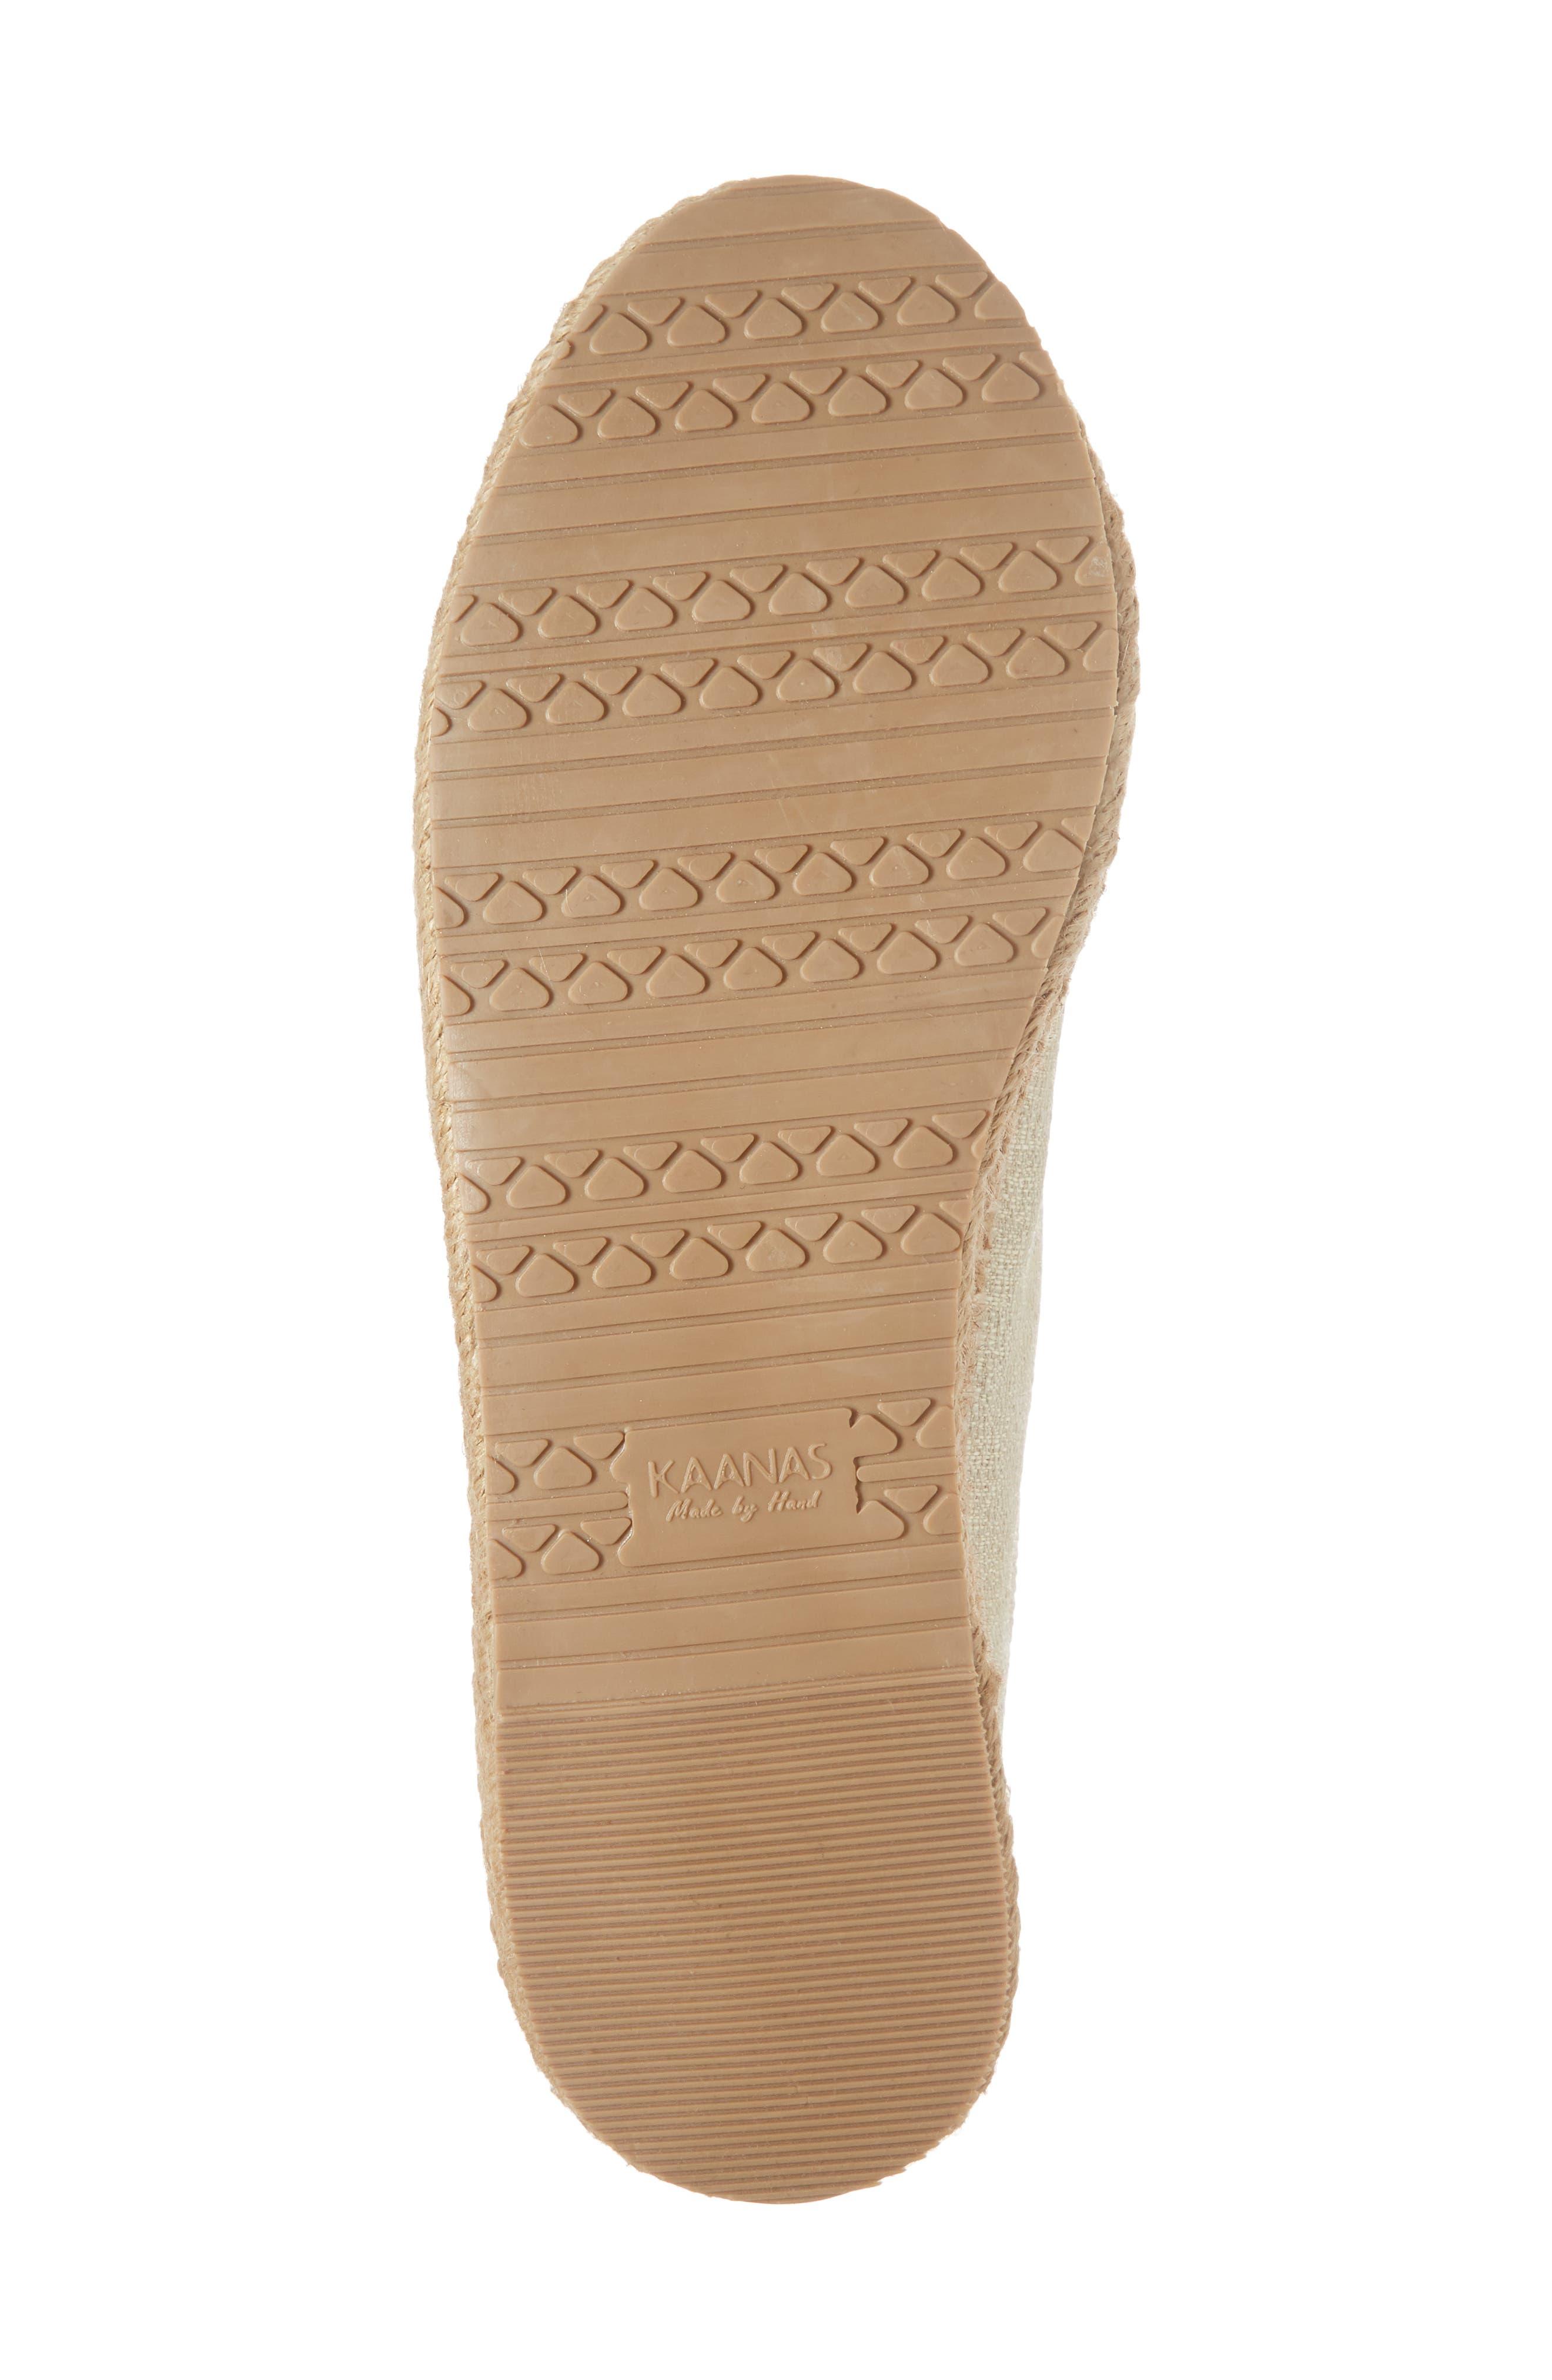 Nogales Sneaker Espadrille,                             Alternate thumbnail 6, color,                             Ivory